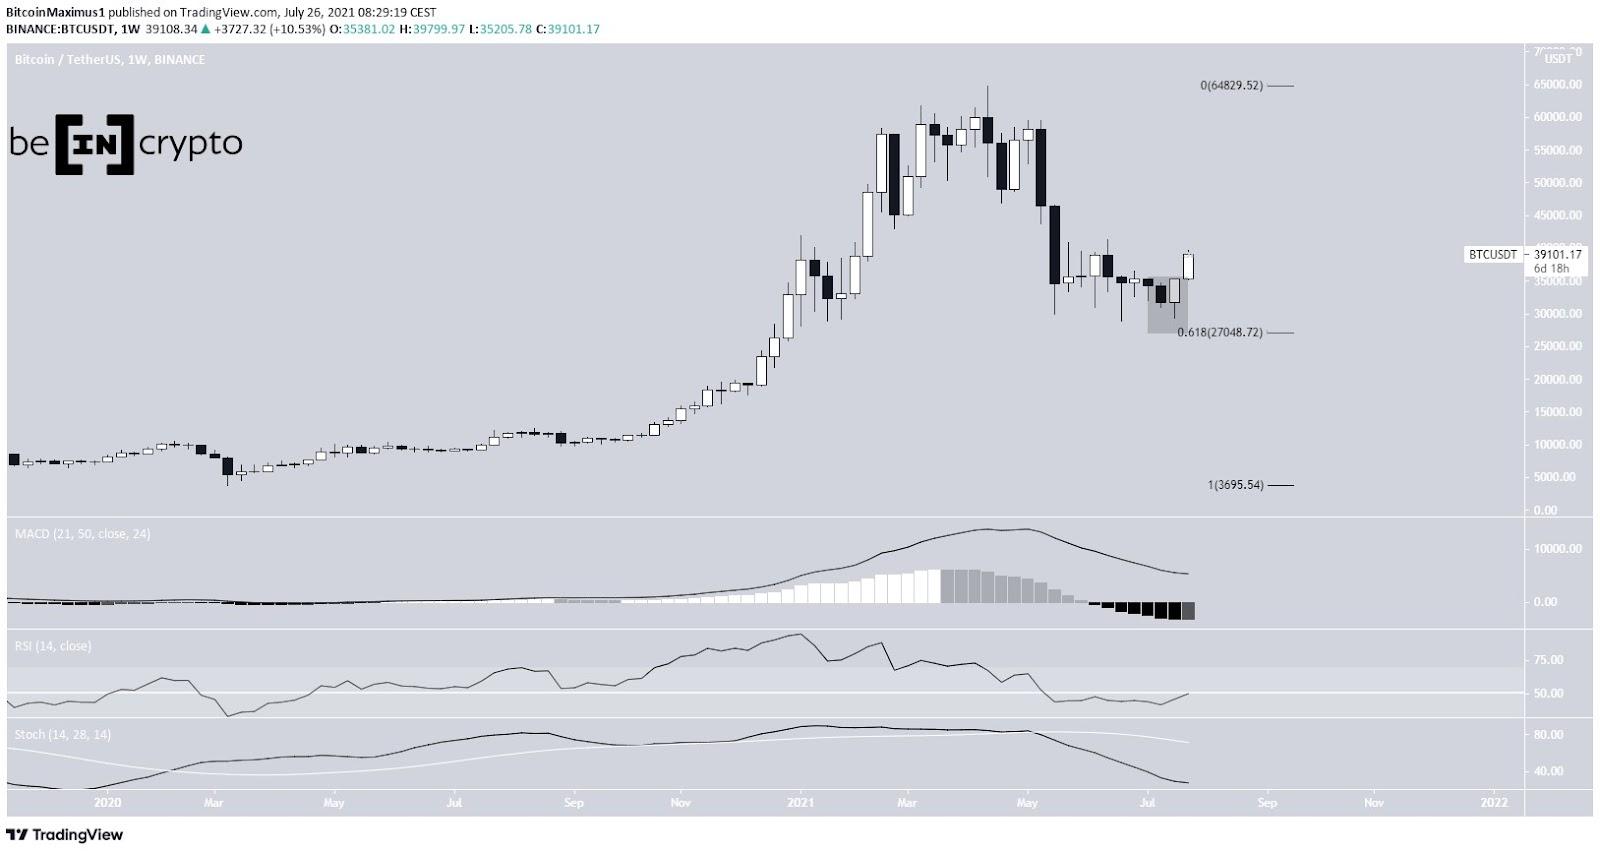 Bitcoin Preis Kurs BTC Wochenchart 26.07.2021